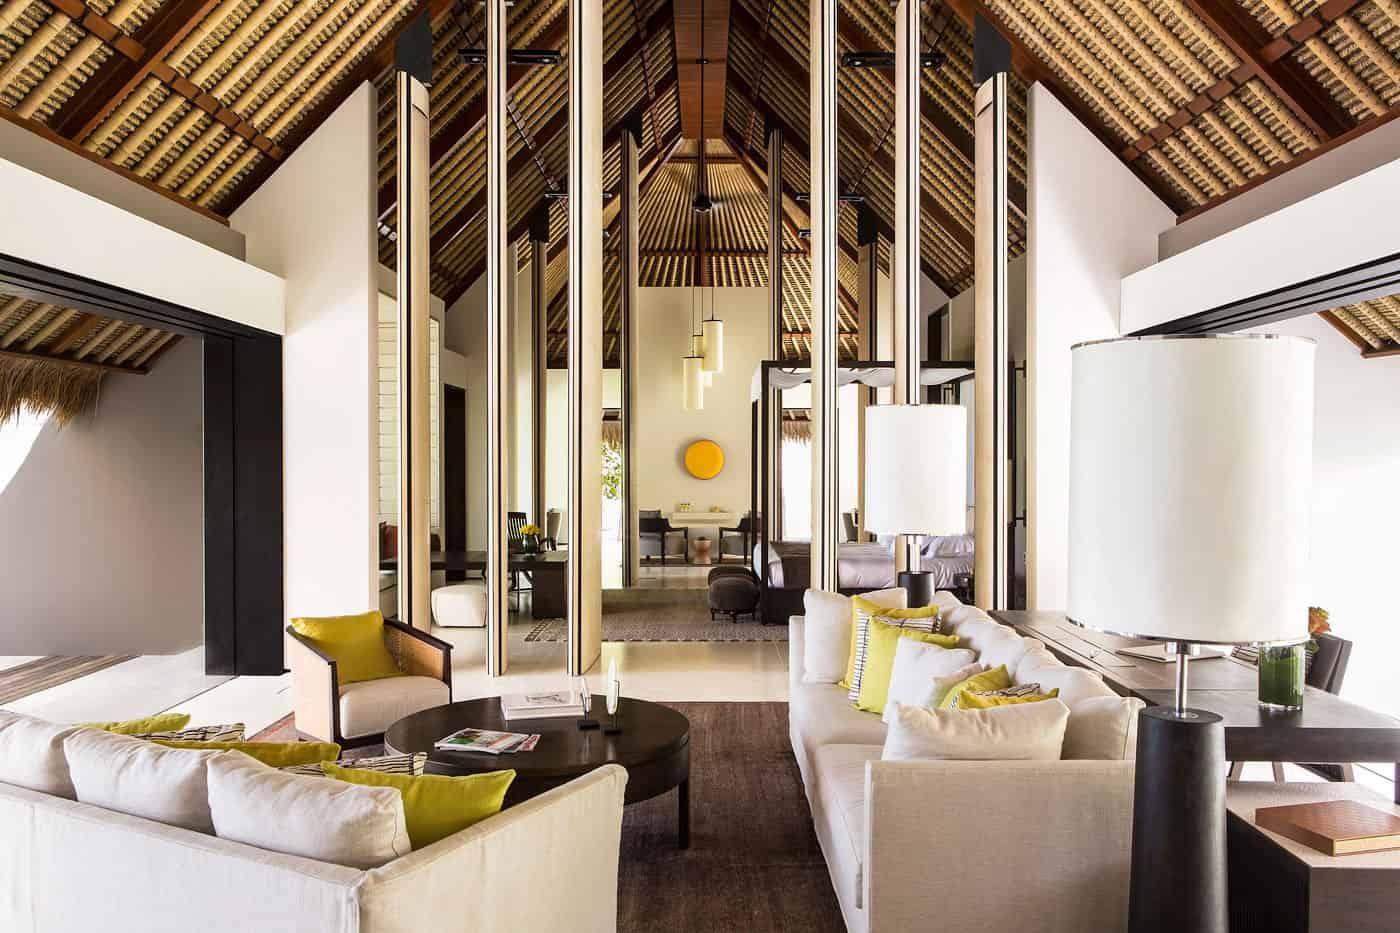 Cheval Blanc Randheli Hotel in the Maldives